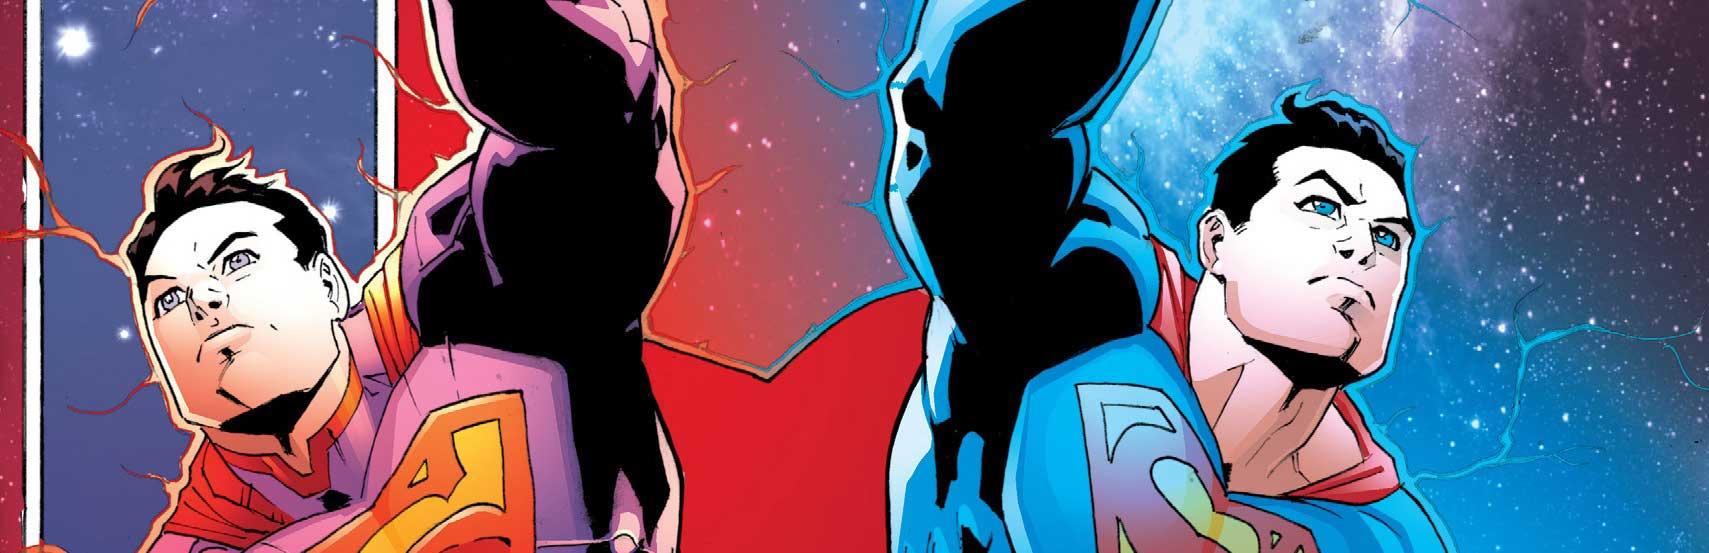 Action Comics 976